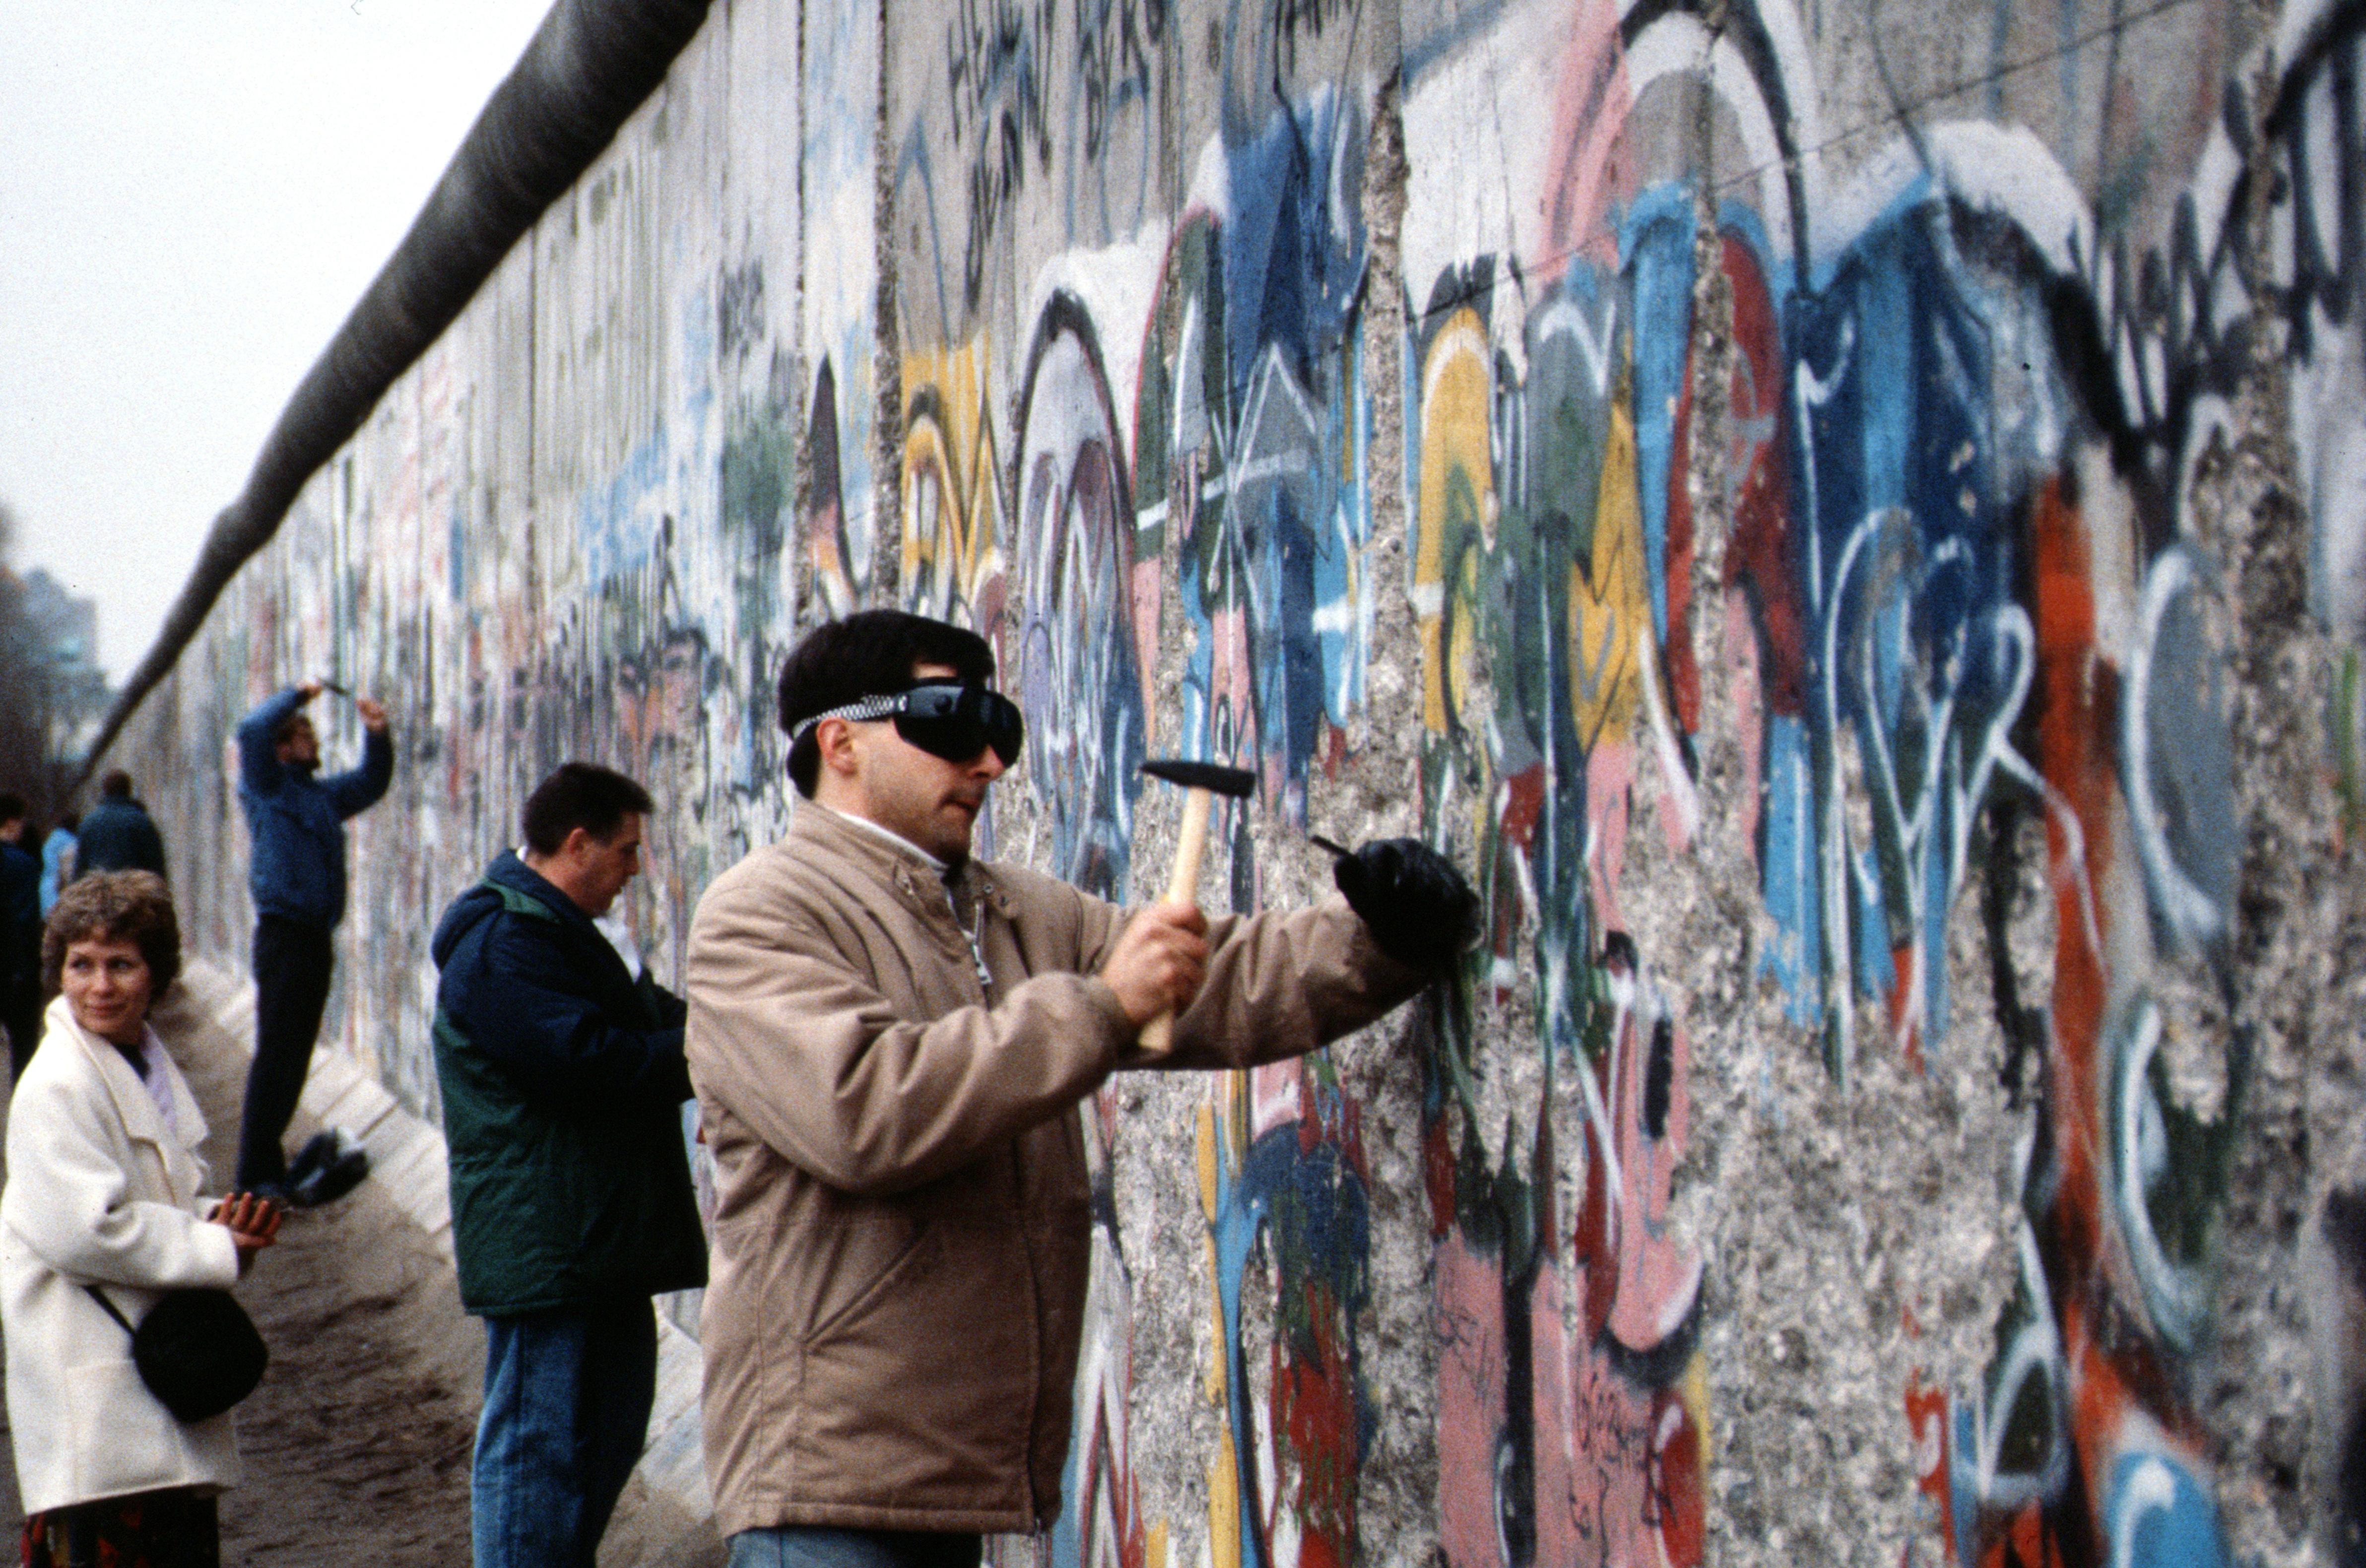 Destruction Of The Berlin Wall File:Berlin 1989, Fall...